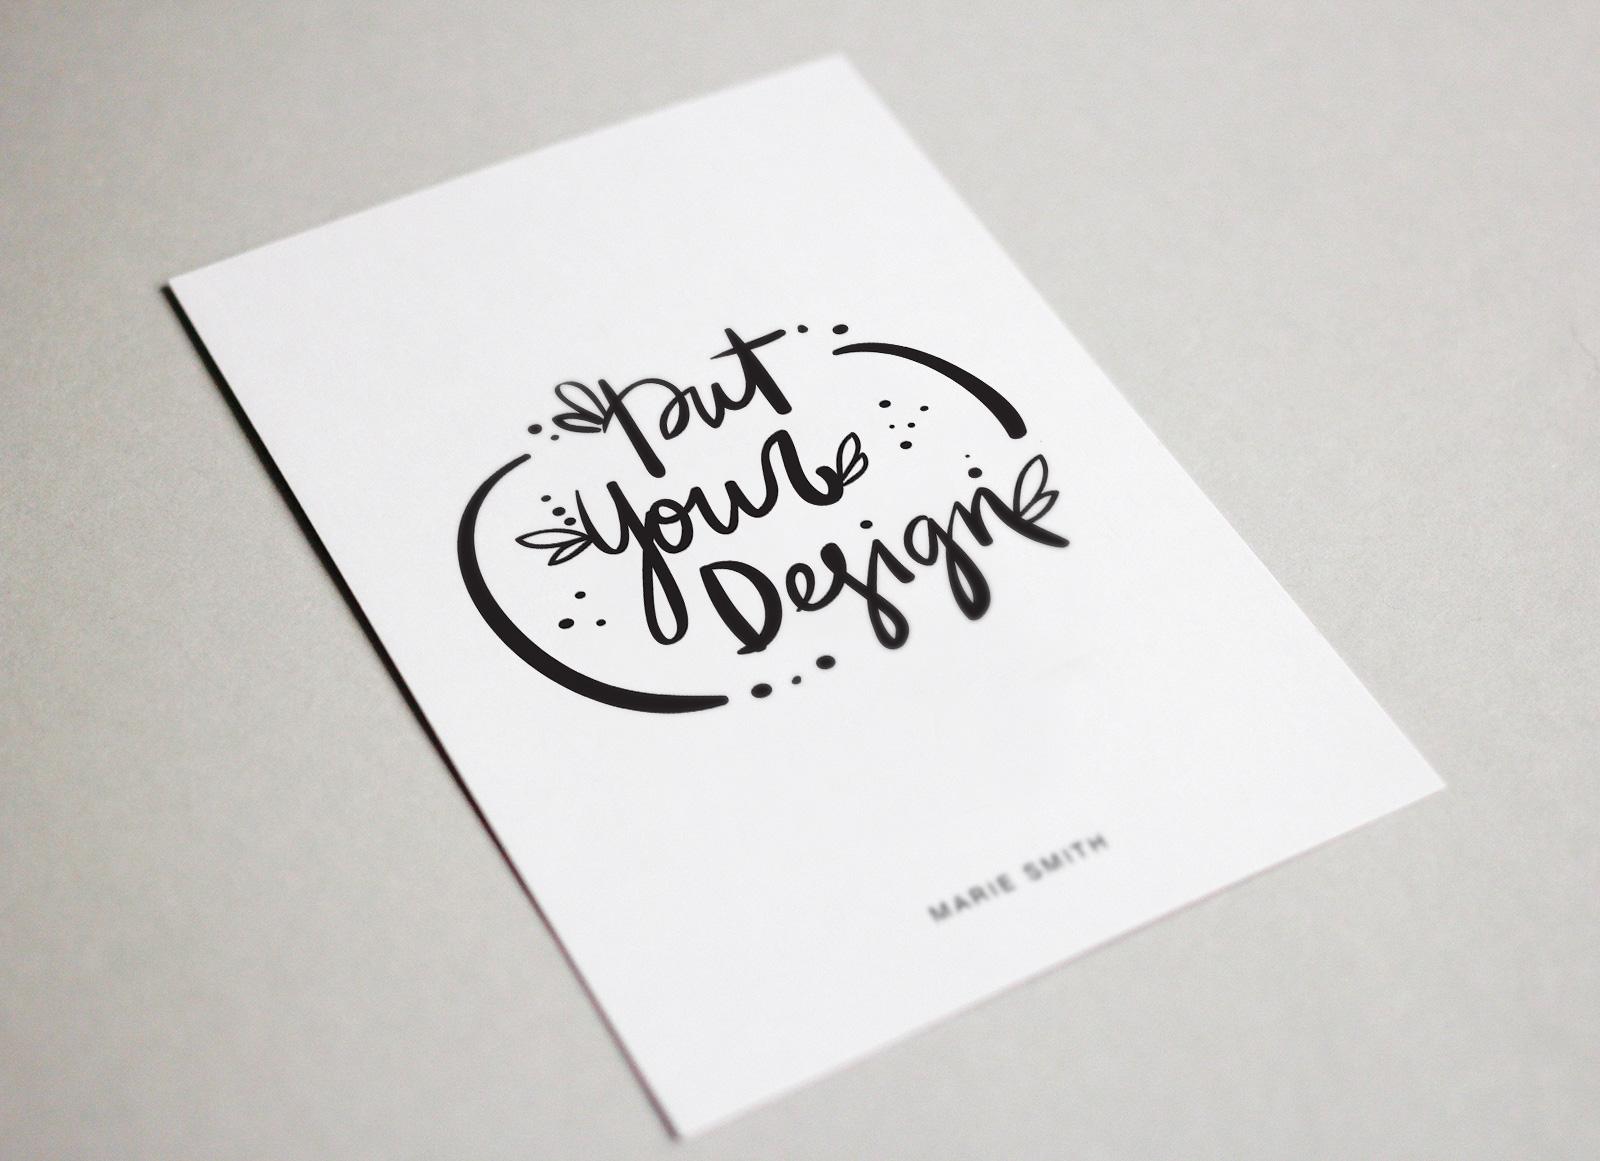 Free-A6-Paper-Postcard-Mockup-PSD-File